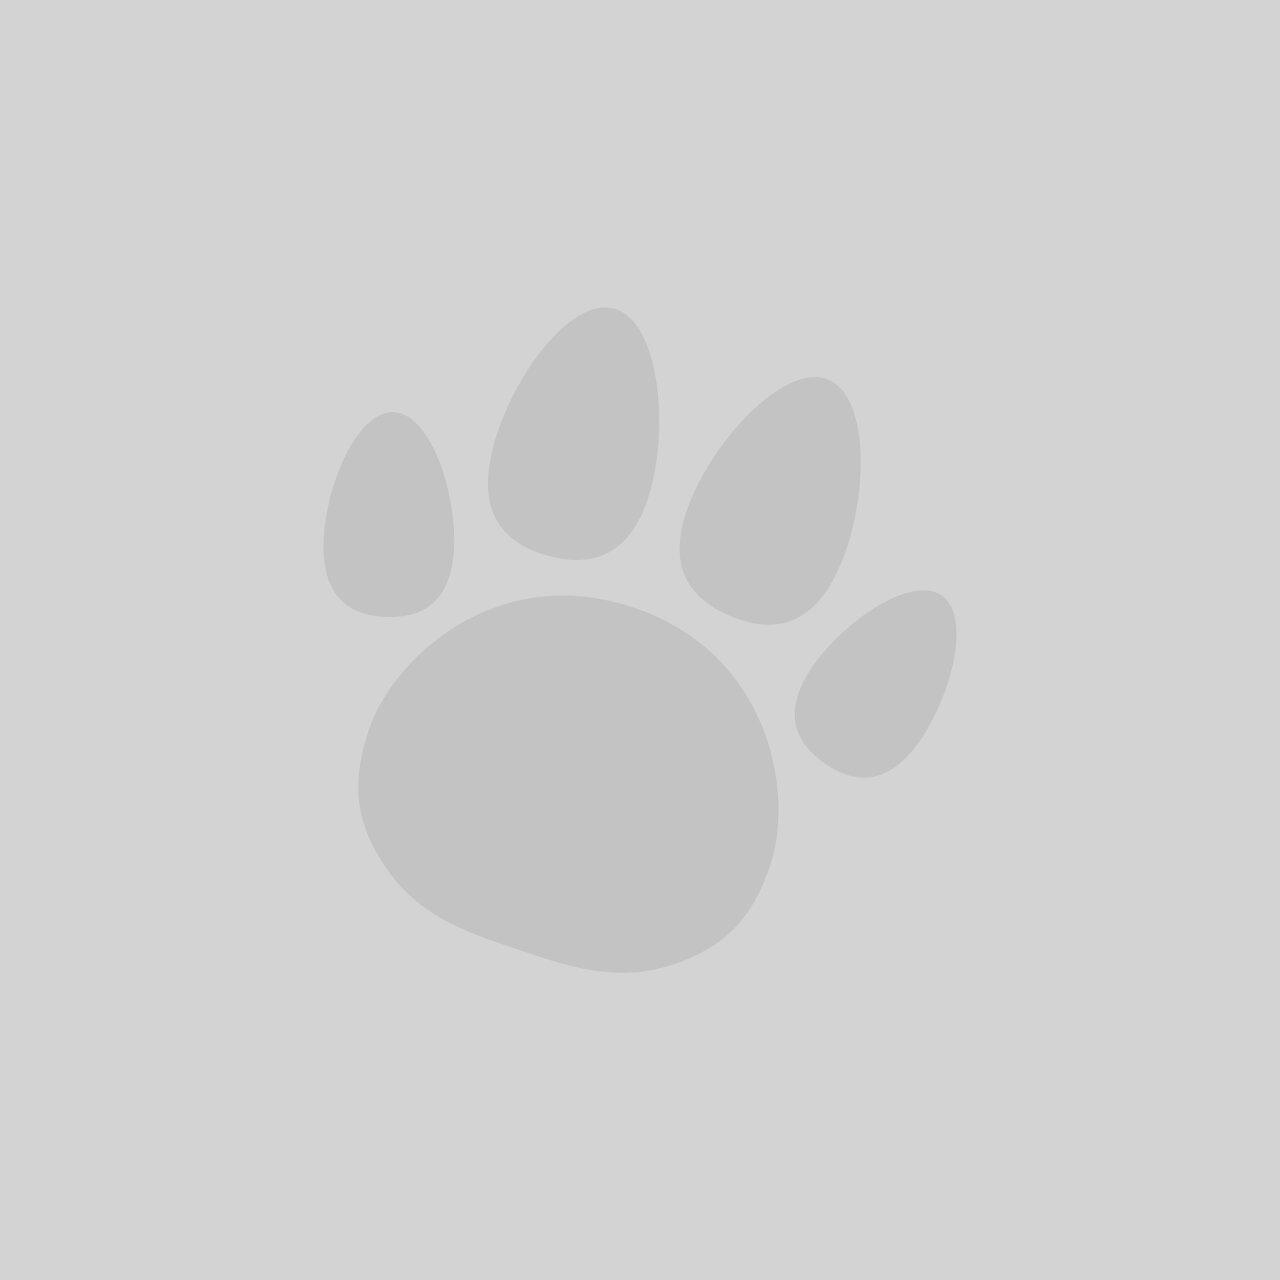 Flexi Neon Giant Retractable Cord Dog Lead 8m - Black Large